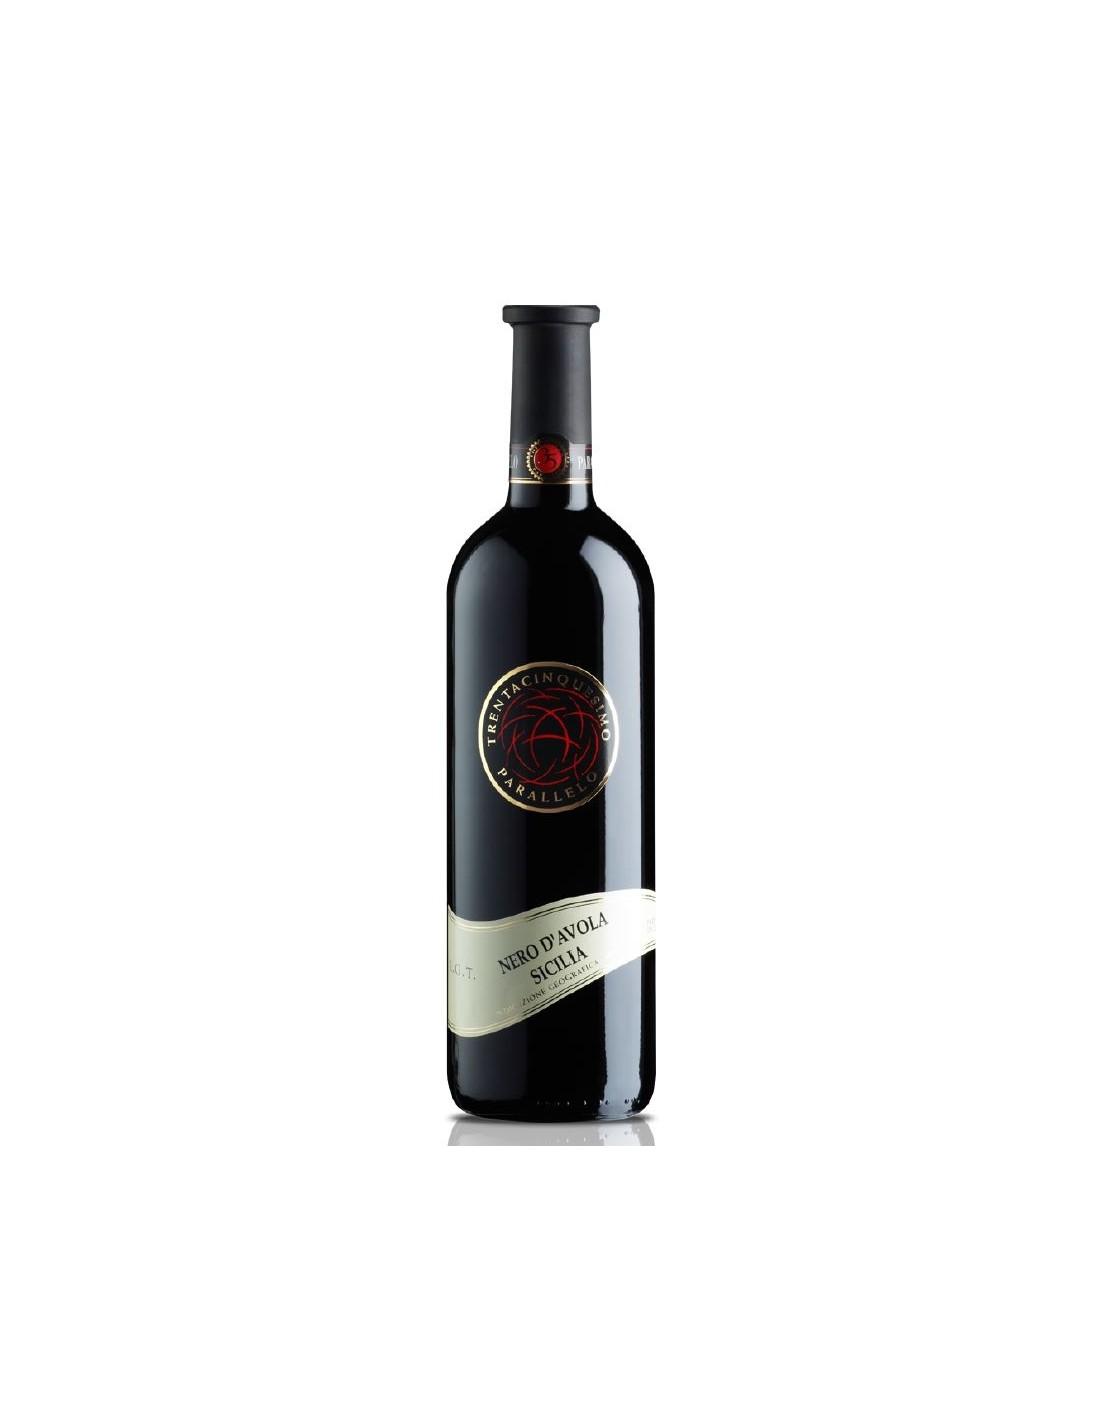 Vin rosu sec, Nero D'avola Sicilia, 0.75L, 13.5% alc., Italia